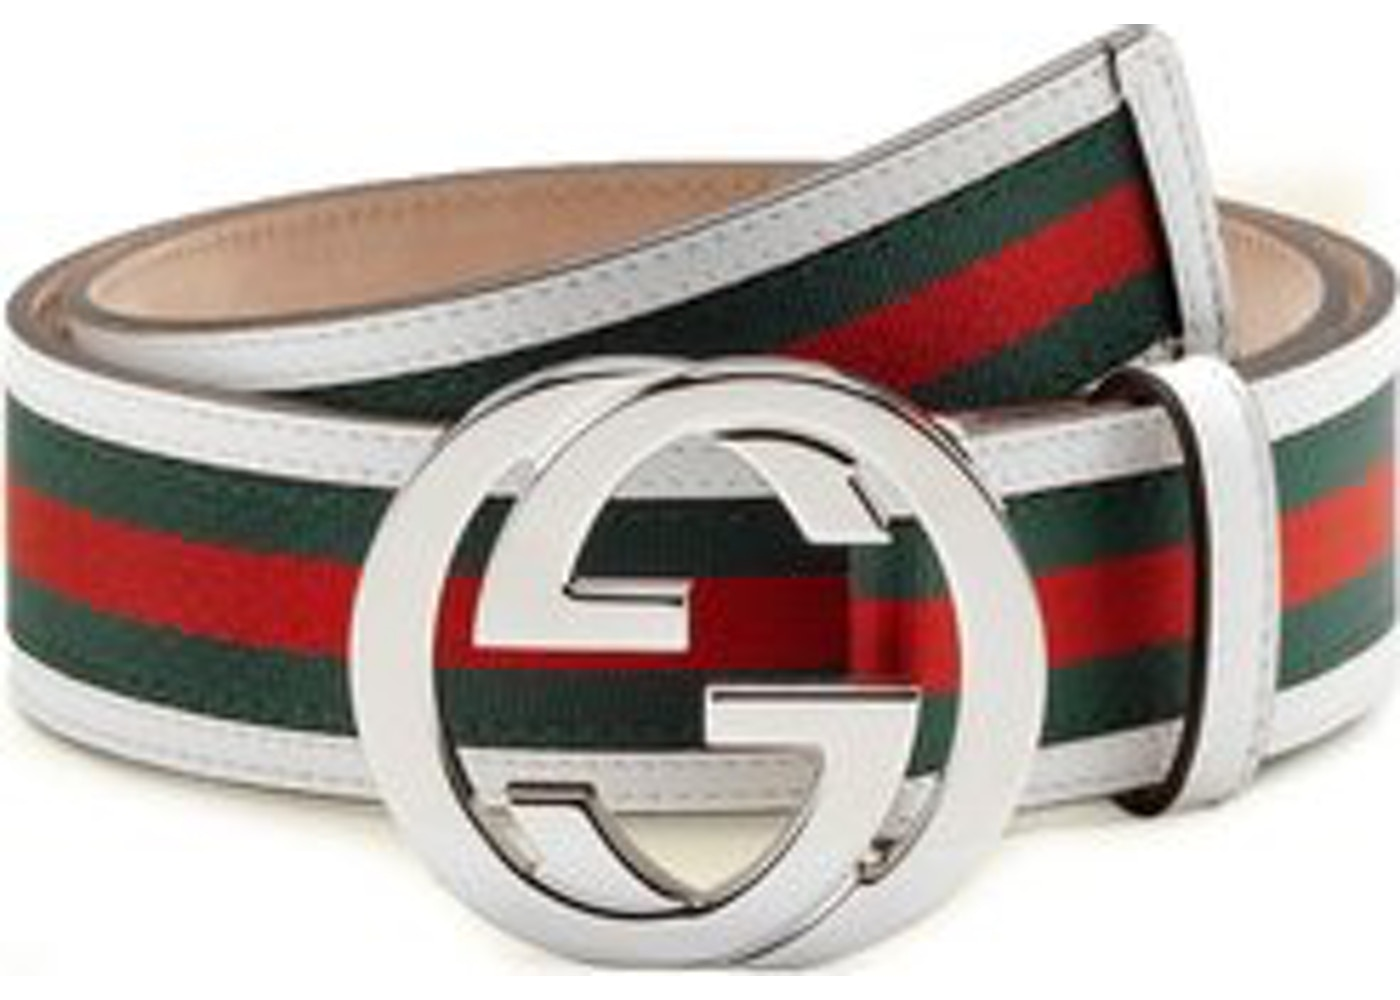 dcf24b87f Gucci Interlocking G Belt Stripes White/Green/Red